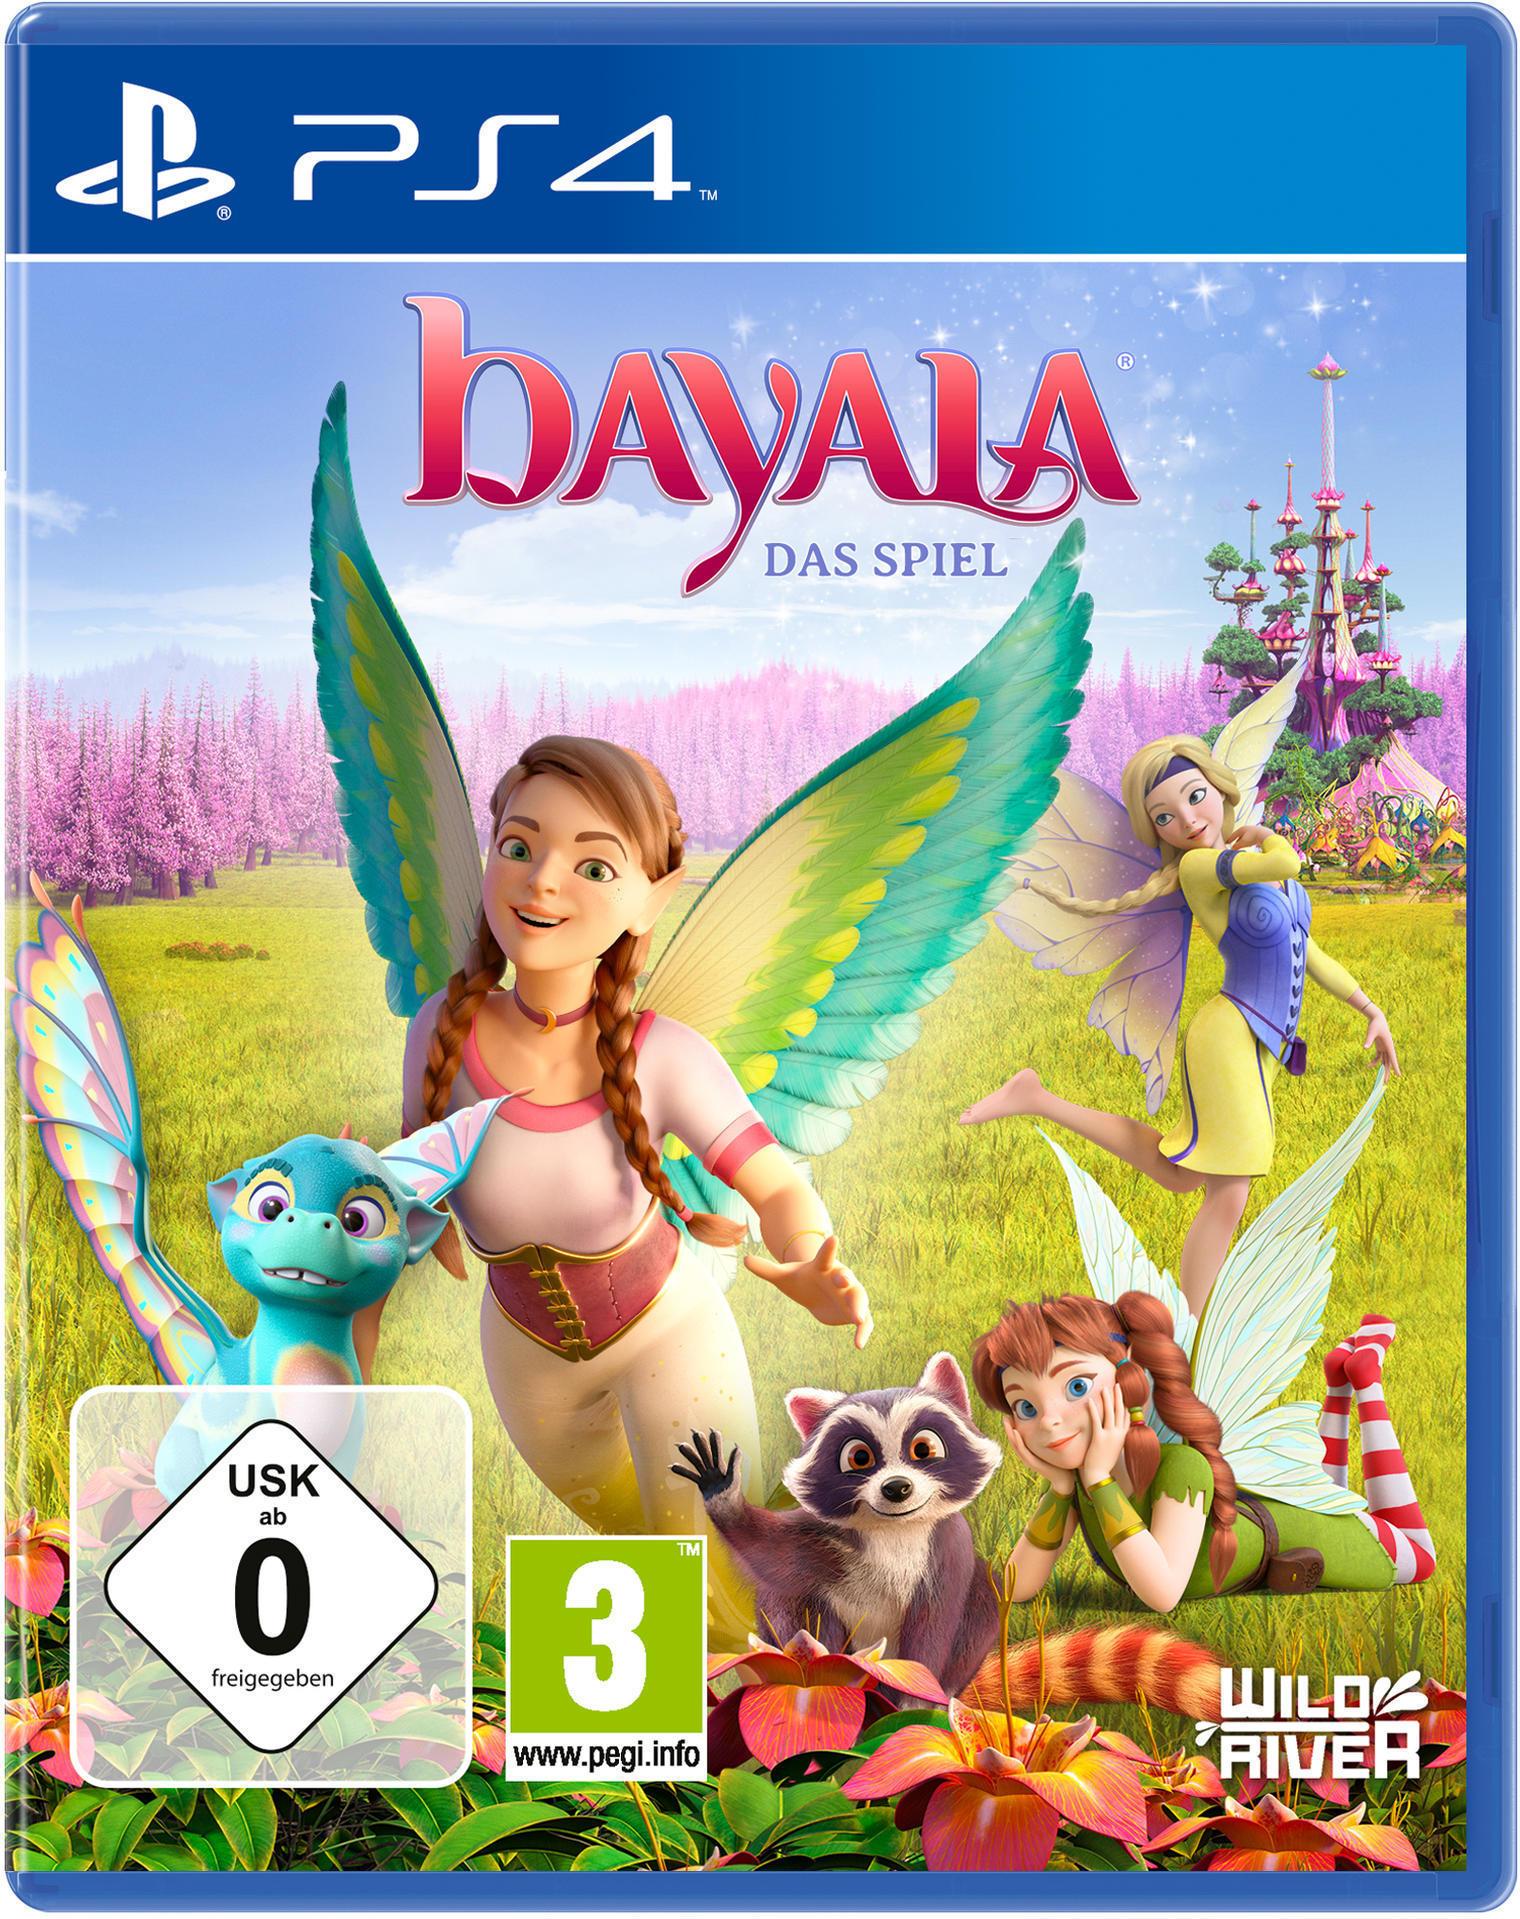 Bayala The Game (PlayStation 4) für 34,96 Euro